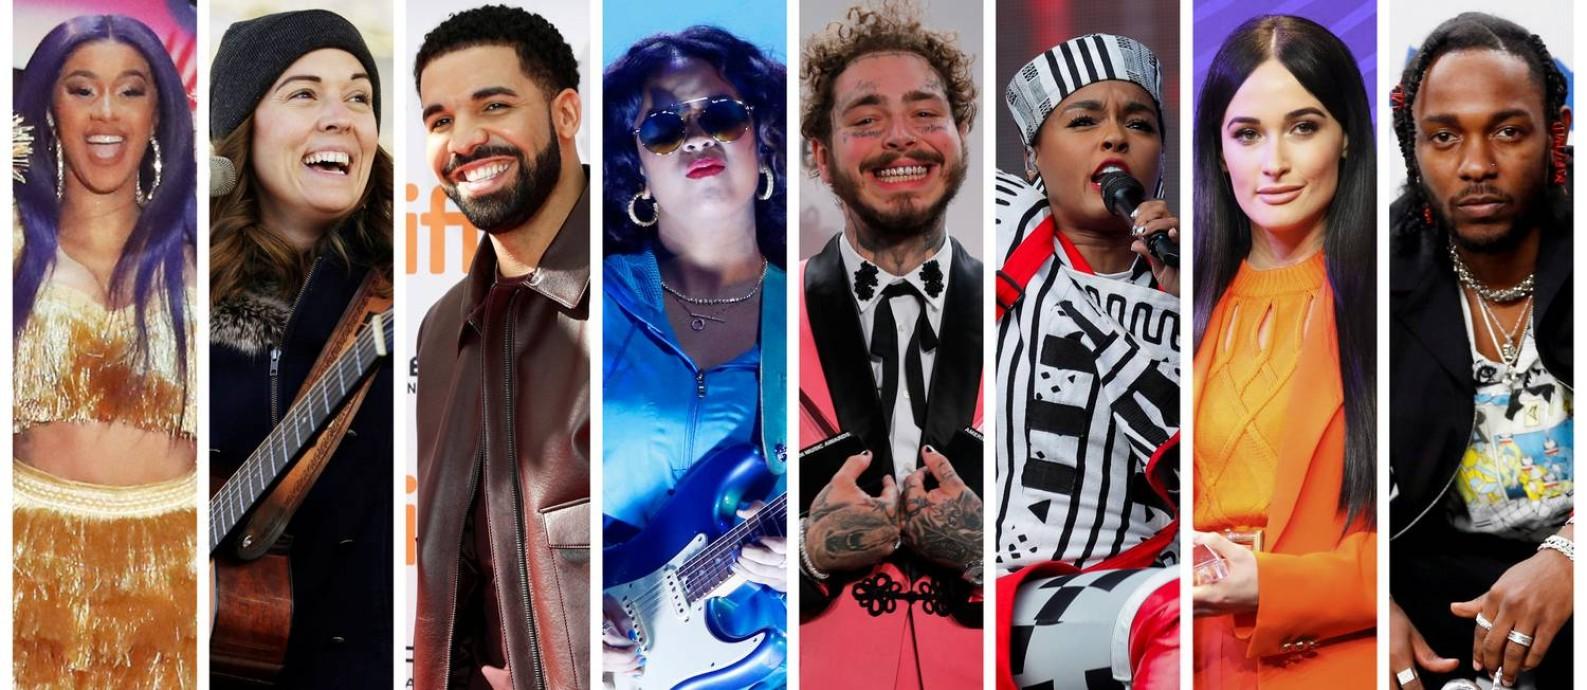 Da esquerda para a direita, os indicados ao prêmio de álbum do ano: Cardi B, Brandi Carlile, Drake, H.E.R., Post Malone, Janelle Monáe, Kacey Musgraves e Kendrick Lamar Foto: REUTERS